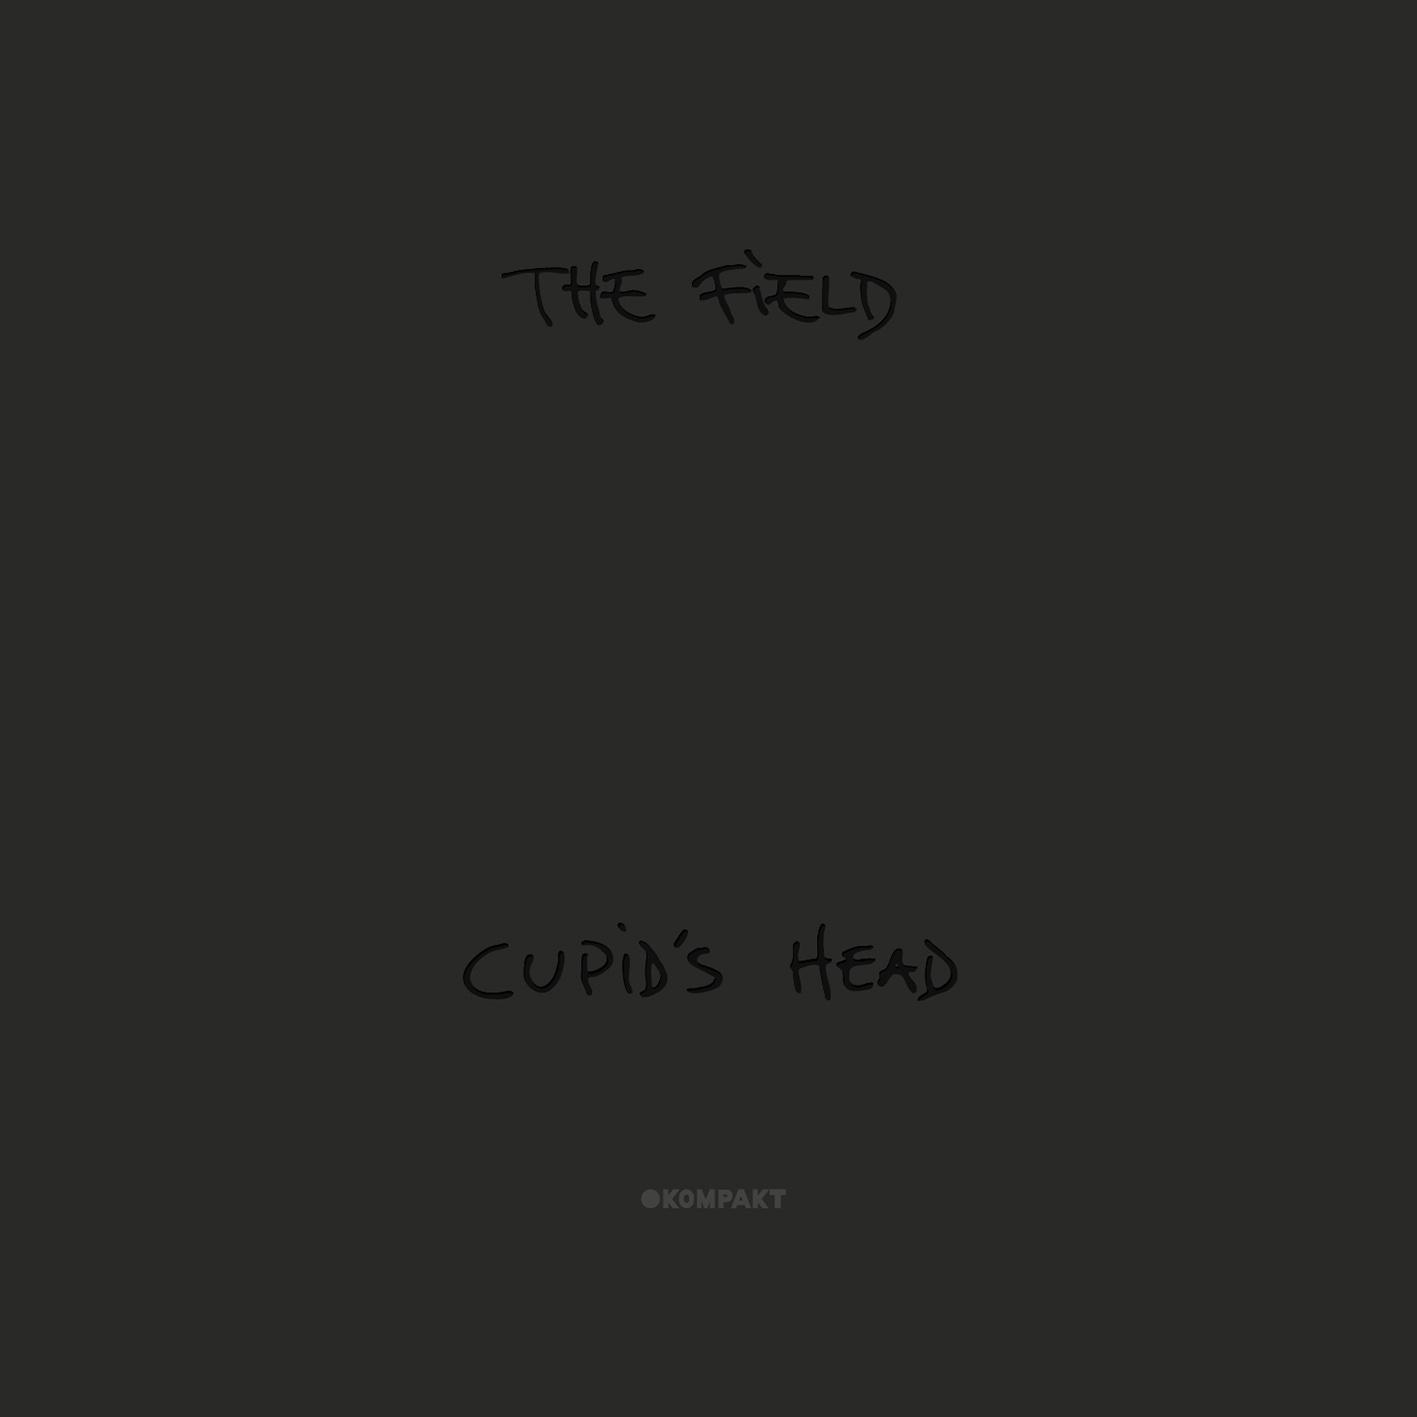 The Field Cupid's Head